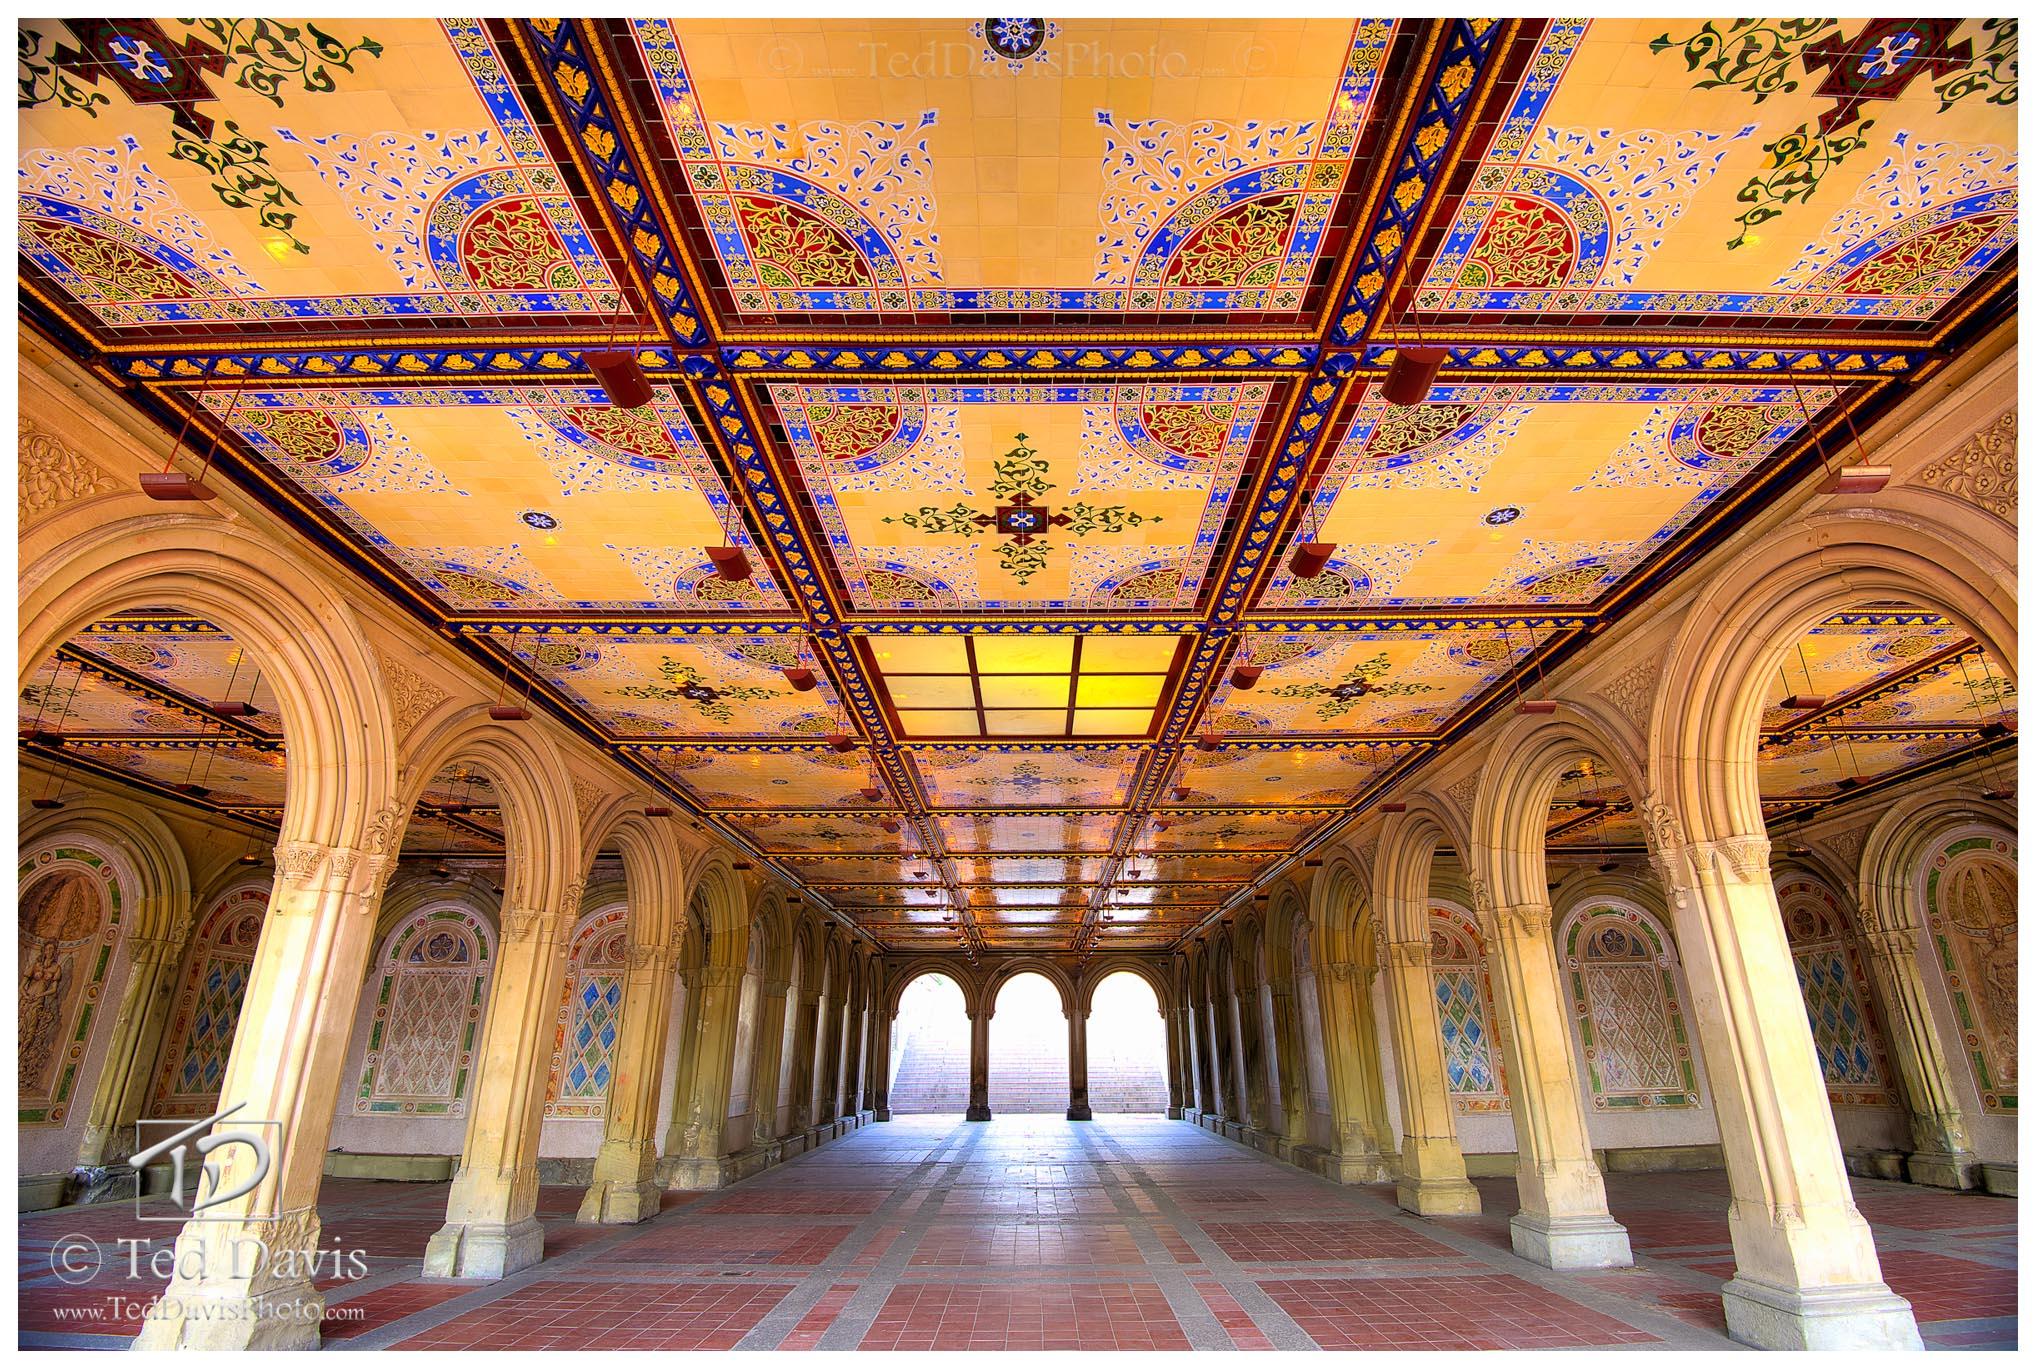 mosaic, New York, Central Park, lake, photo